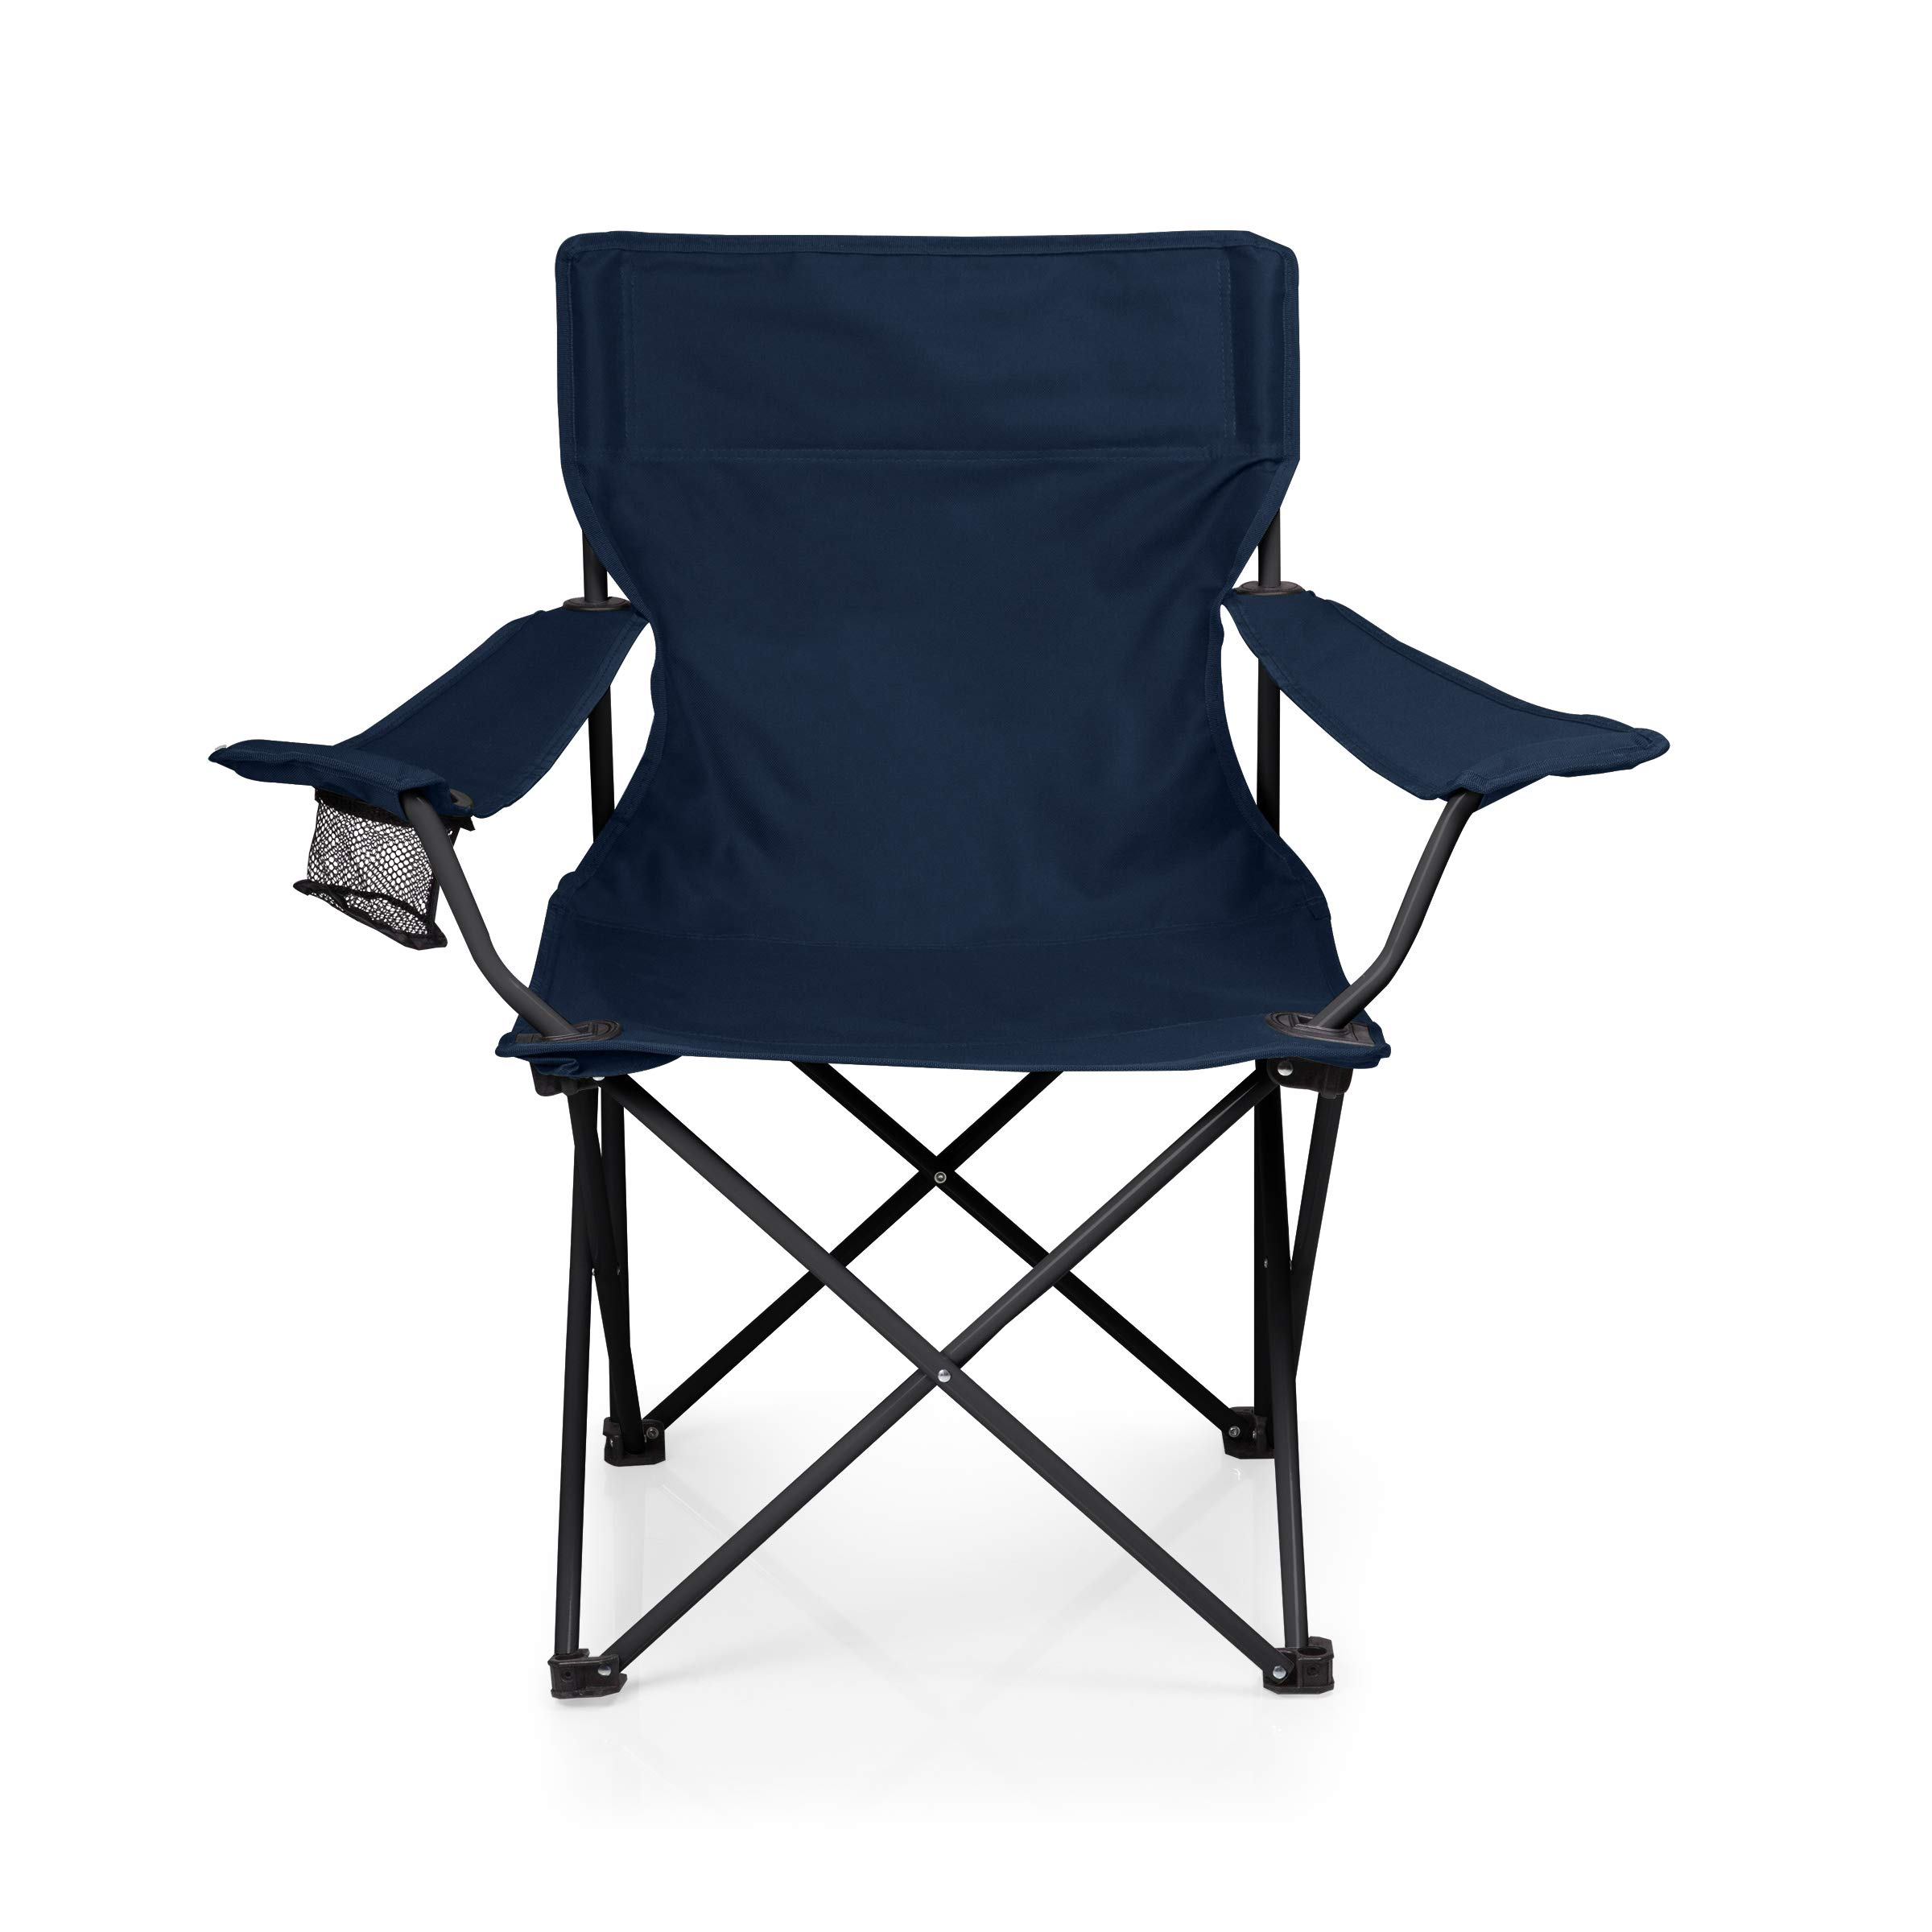 ONIVA - a Picnic Time Brand PTZ Portable Folding Camp Chair, Navy by ONIVA - a Picnic Time brand